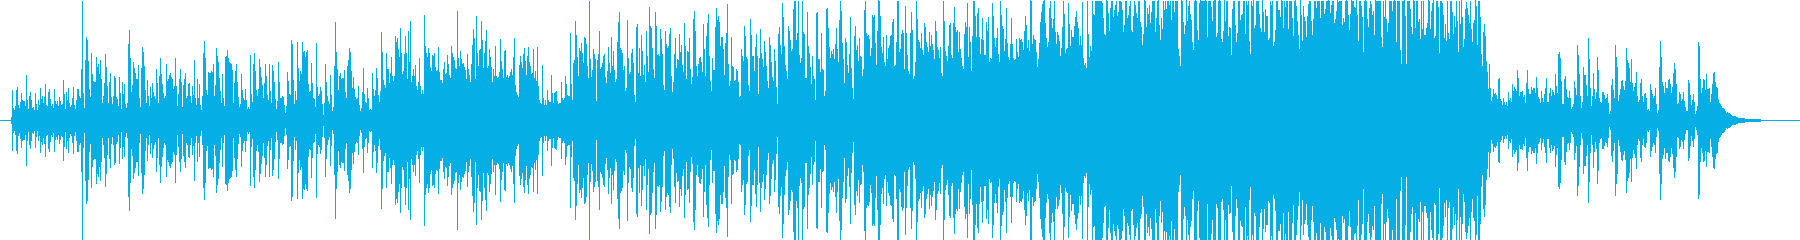 tatebueの再生済みの波形